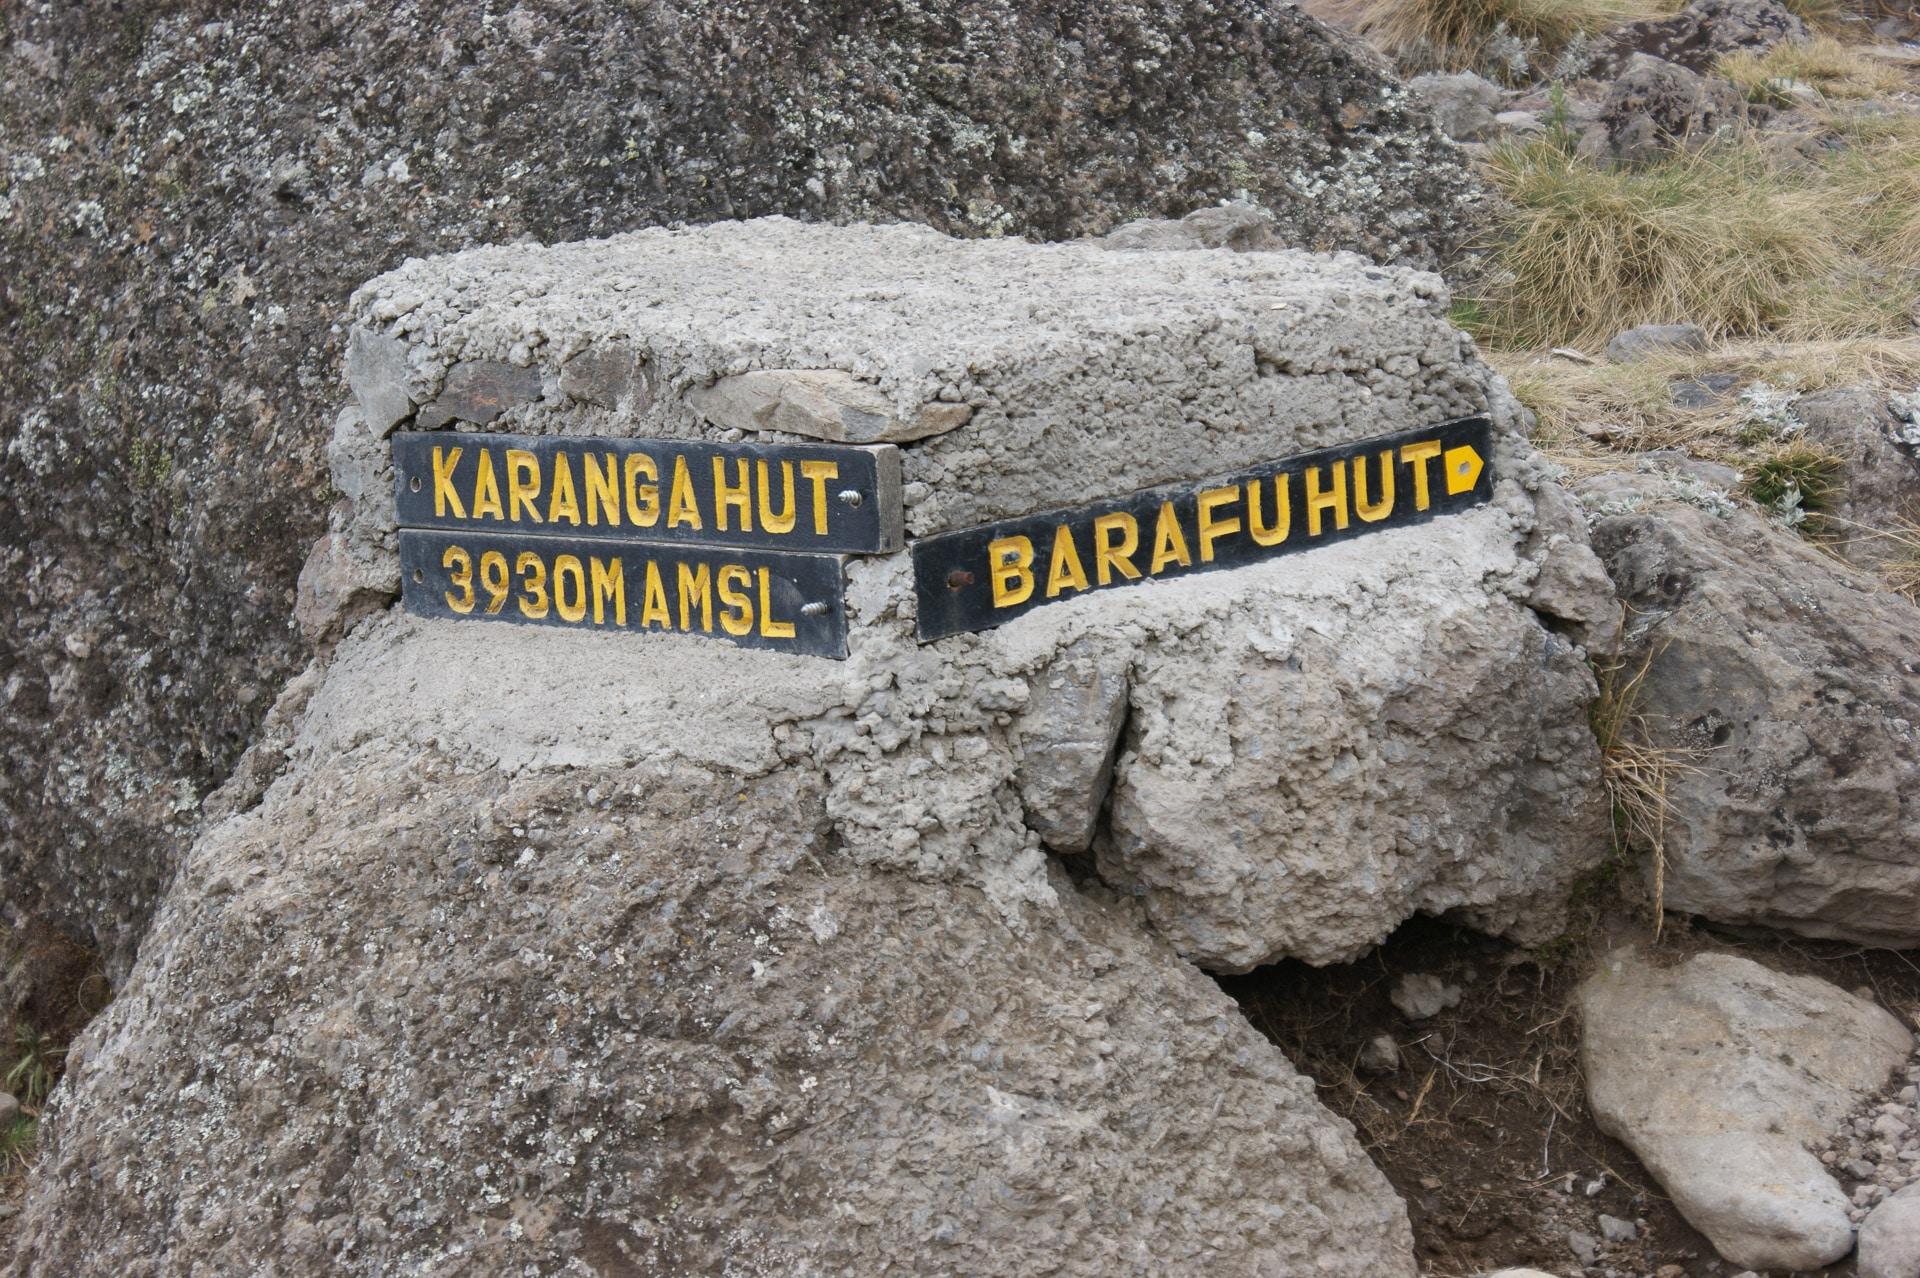 Kilimanjaro-Tansania-Globetrotter-Select-Krause-10